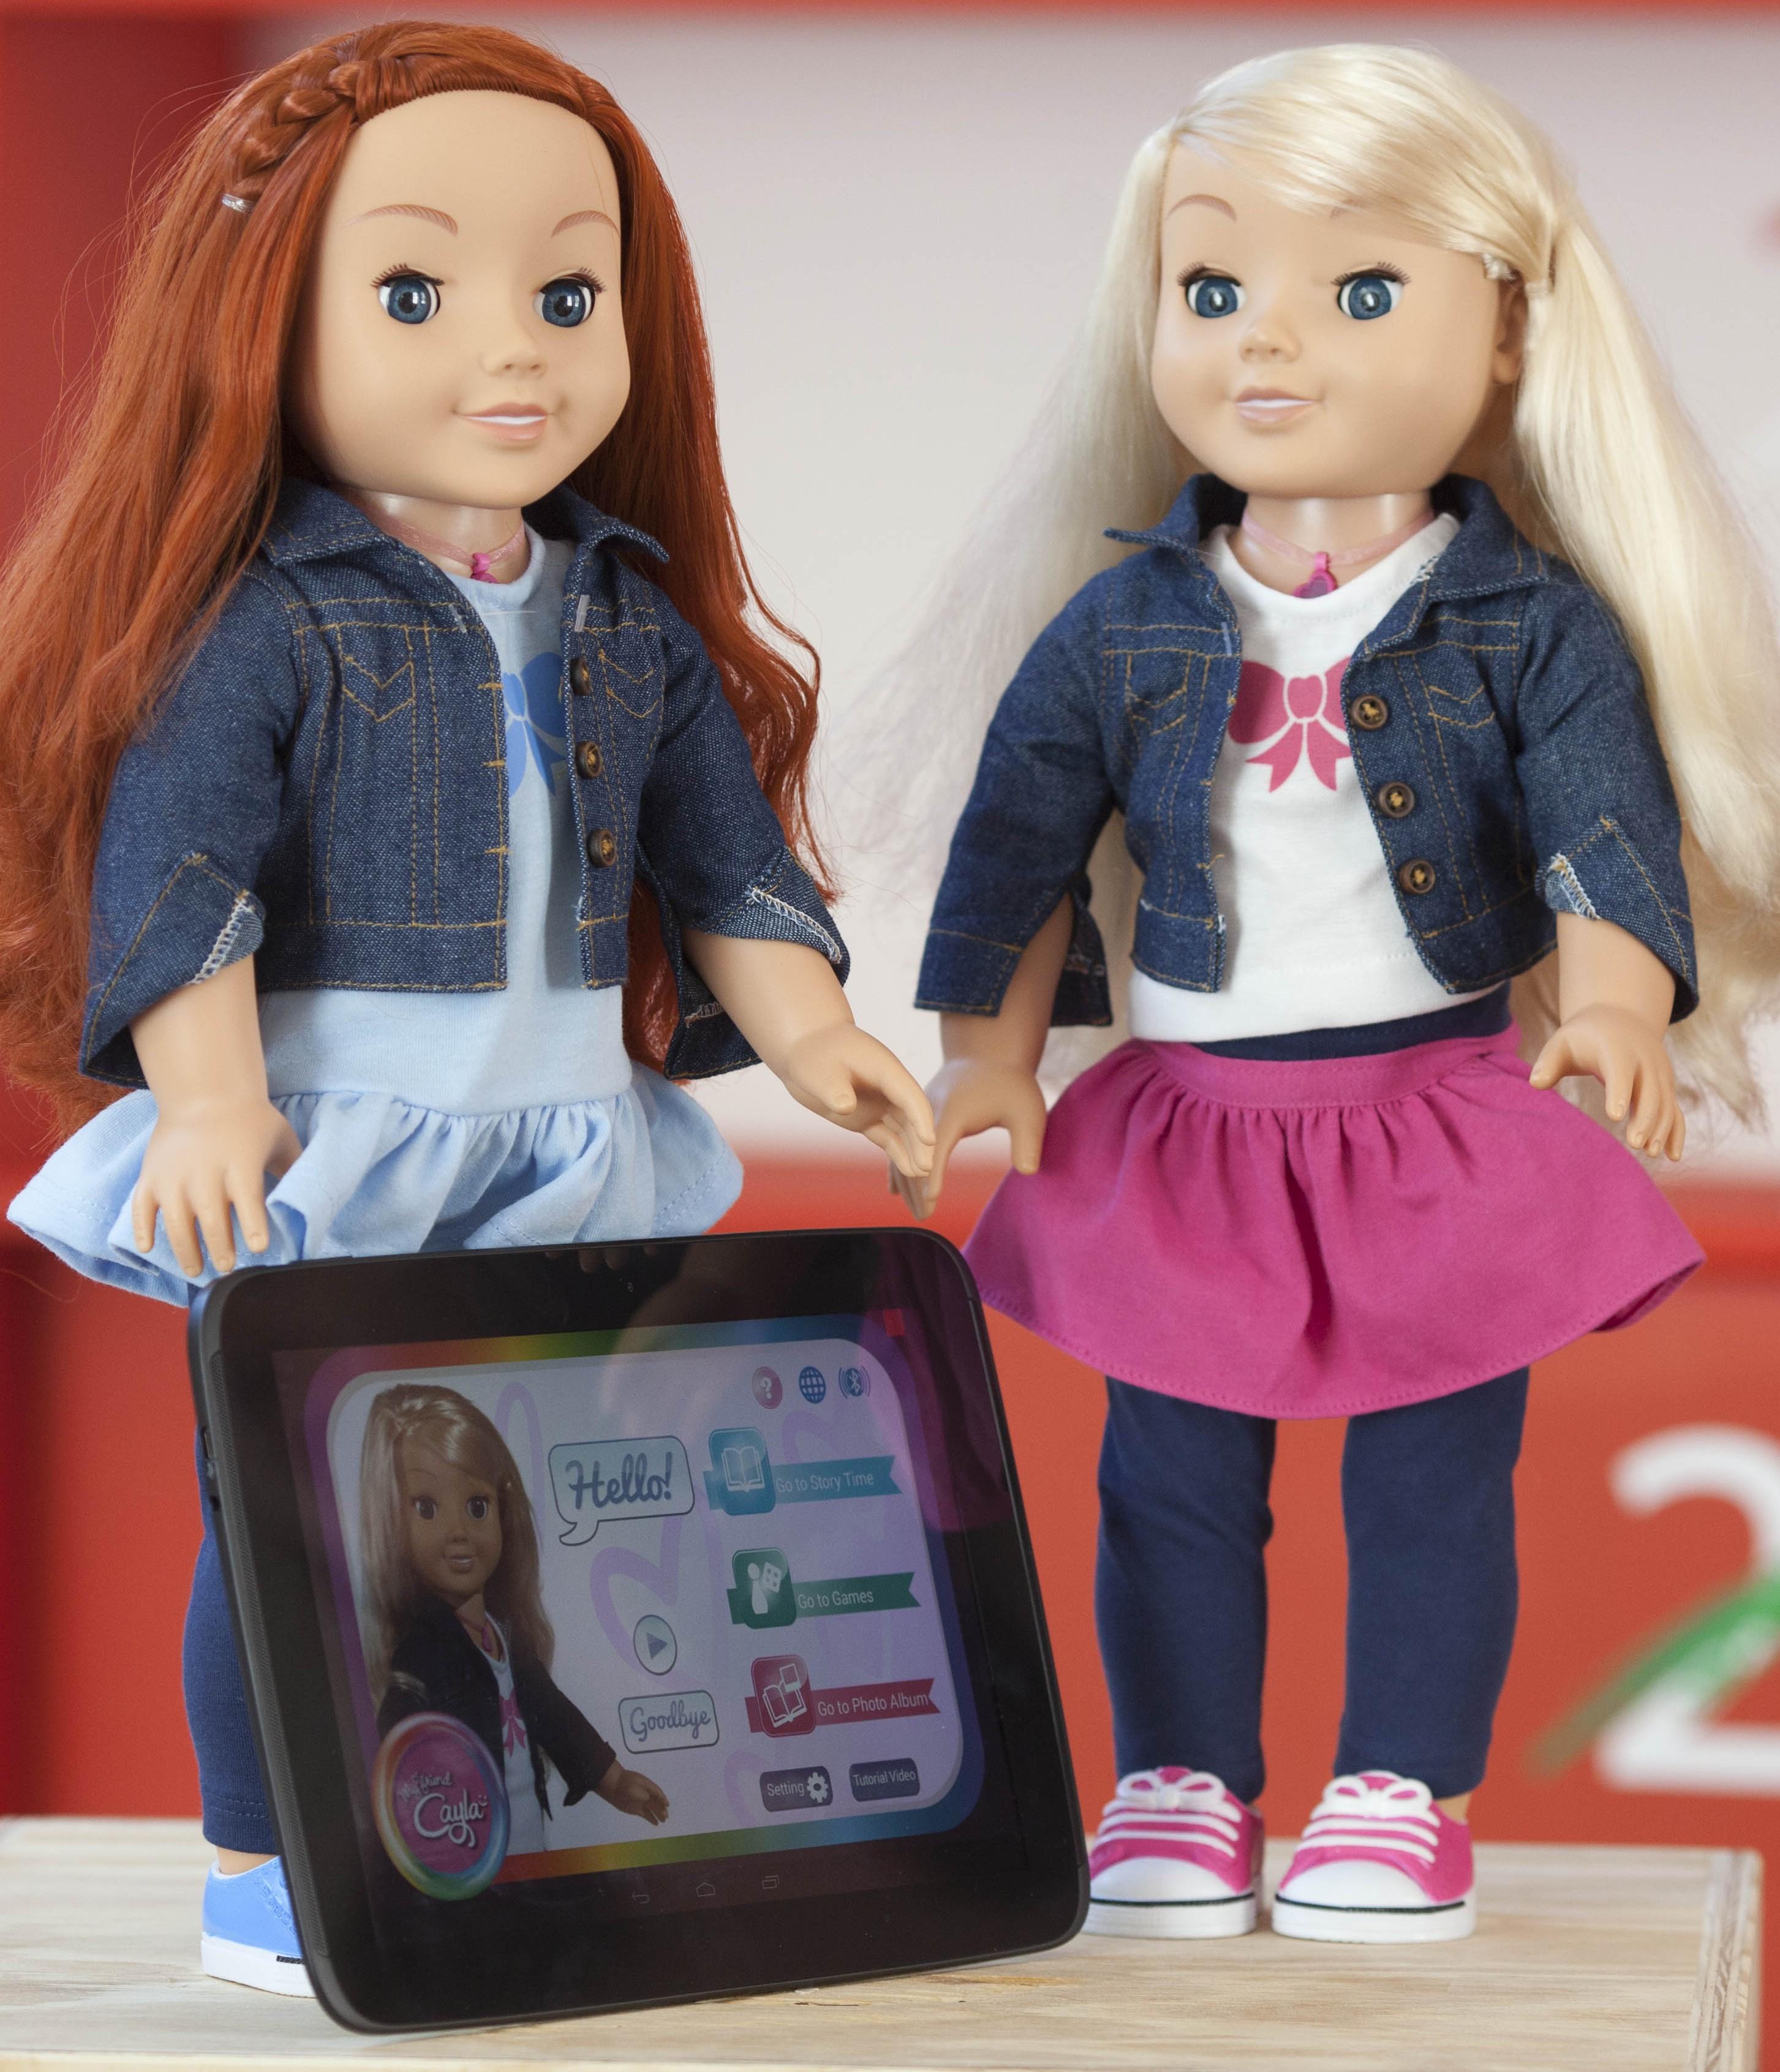 Argos top toys for Christmas 2014